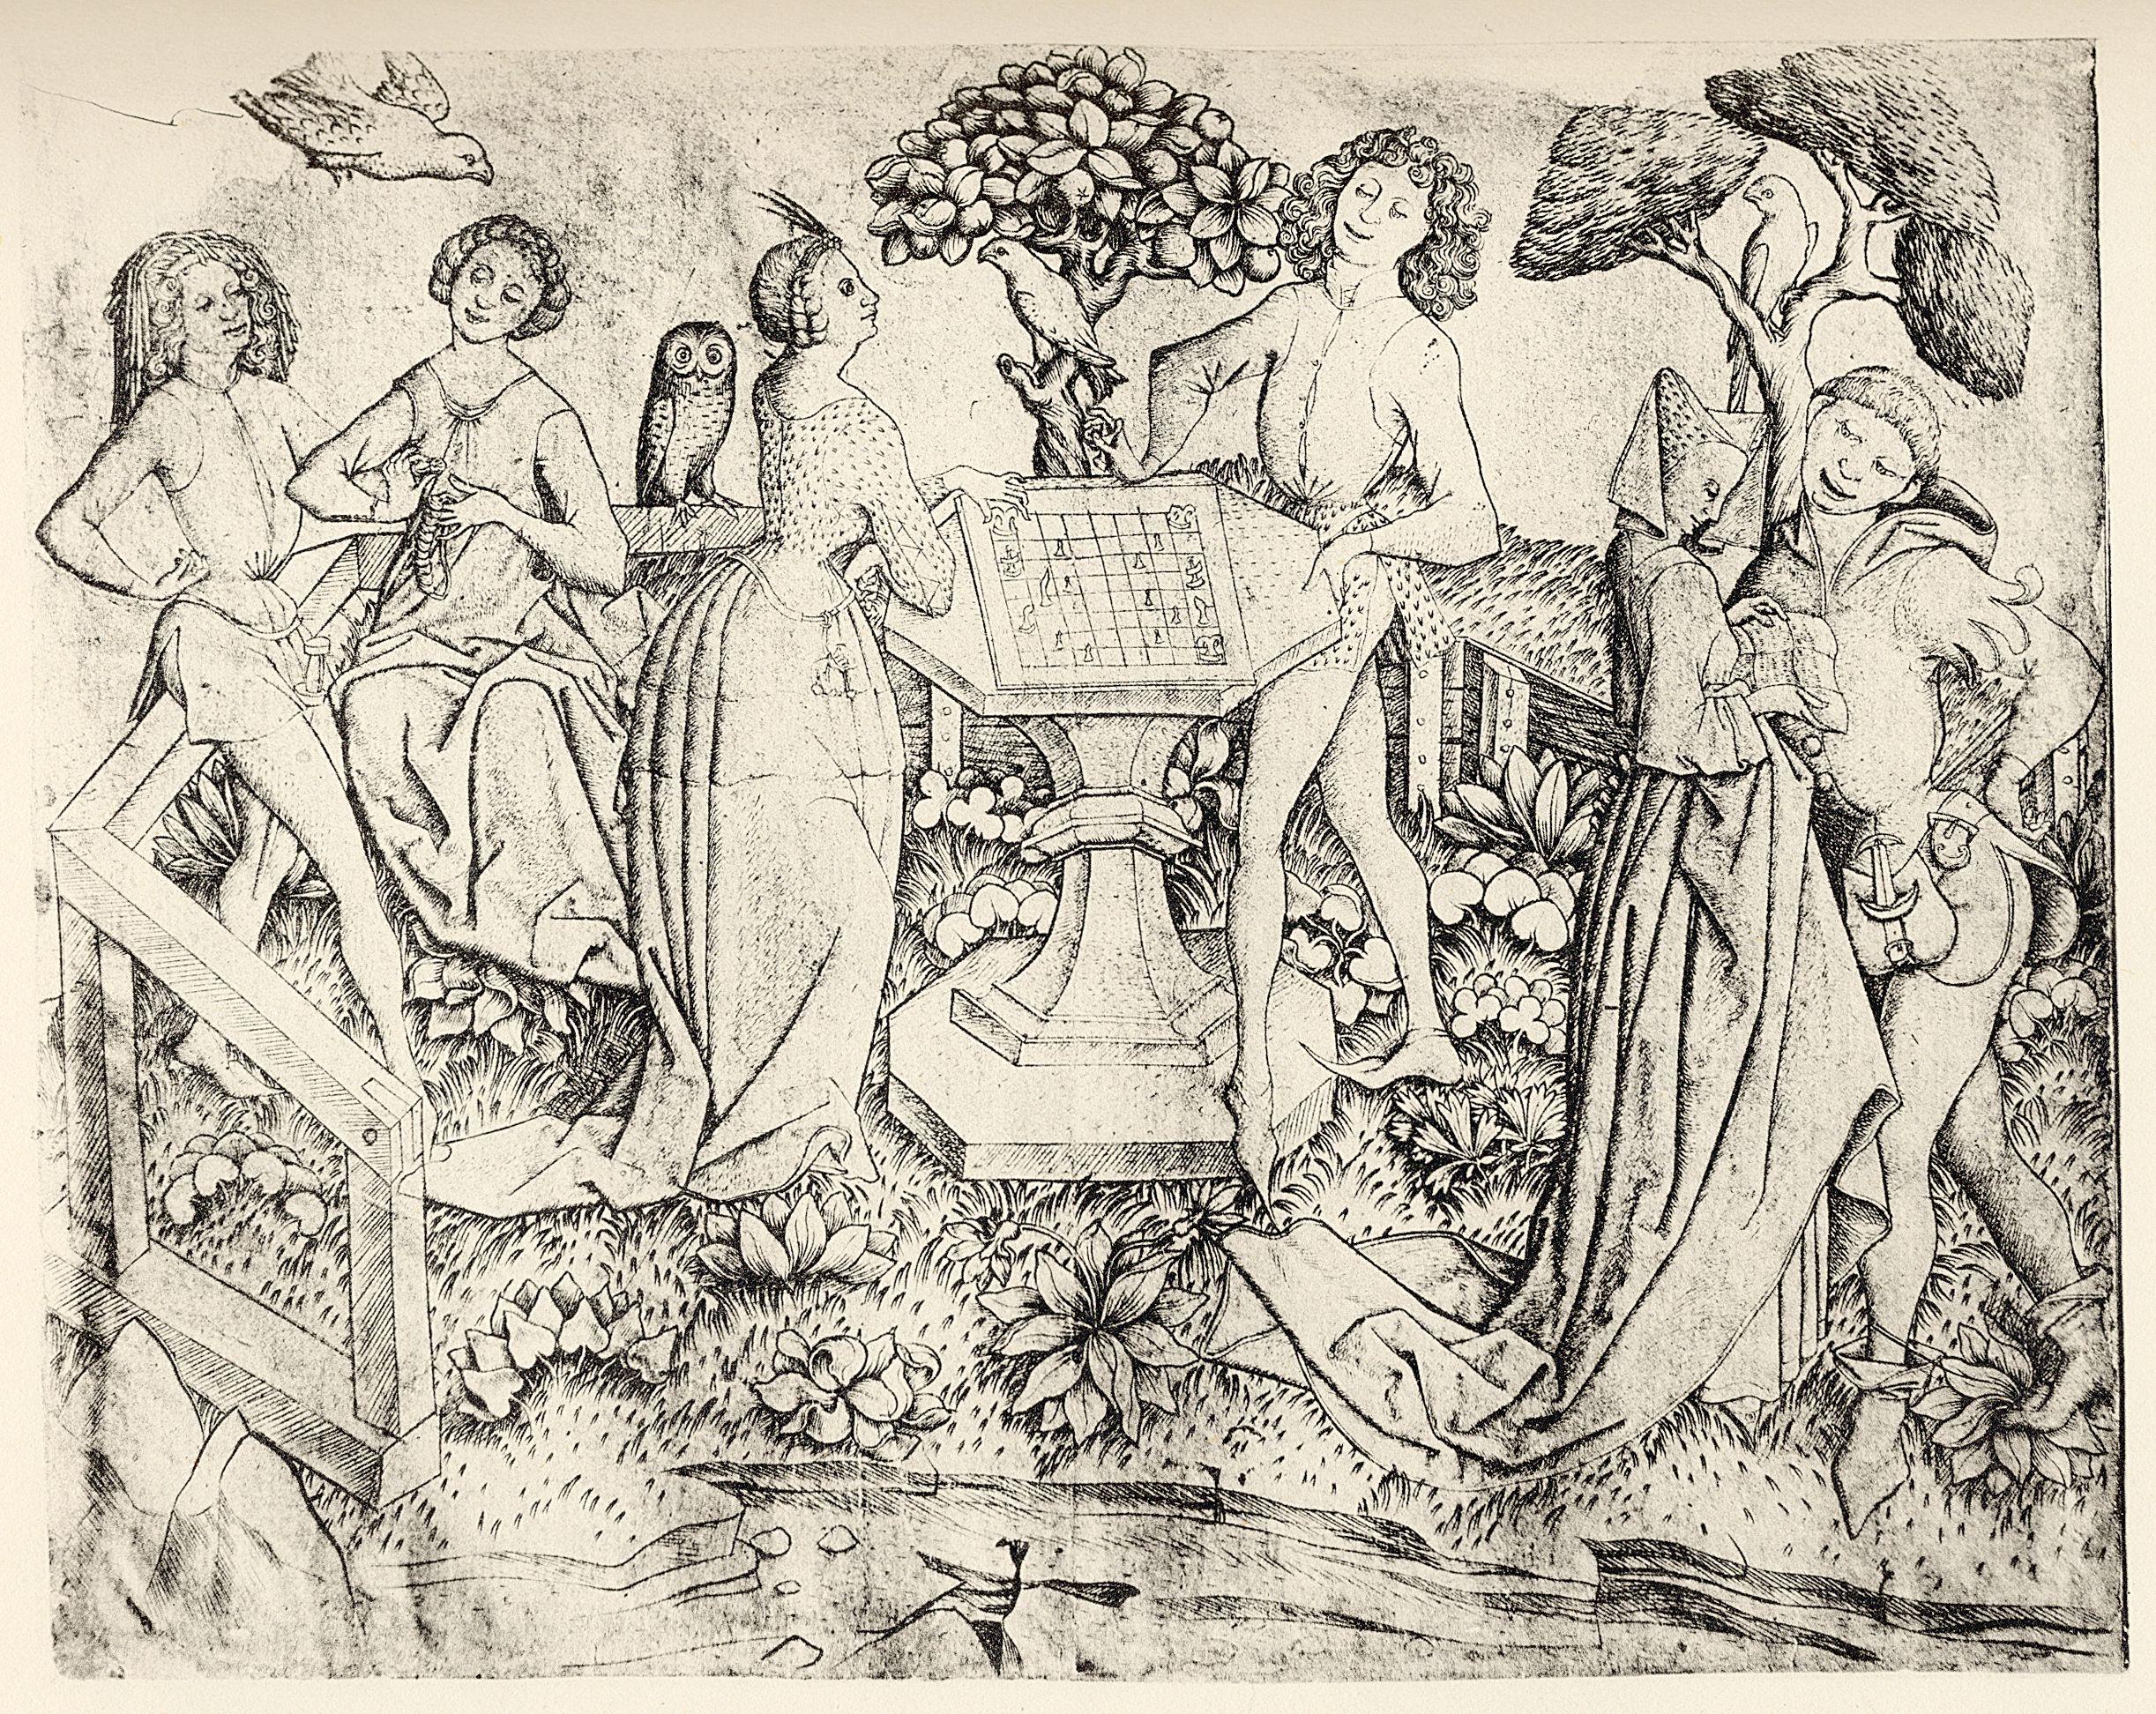 Master E.S. (предположительно). Большой сад любви с шахматистами. 1460-1467. Ксилография. 16,8х21,0 см. Гравюрный кабинет, Берлин. Источник https://upload.wikimedia.org/